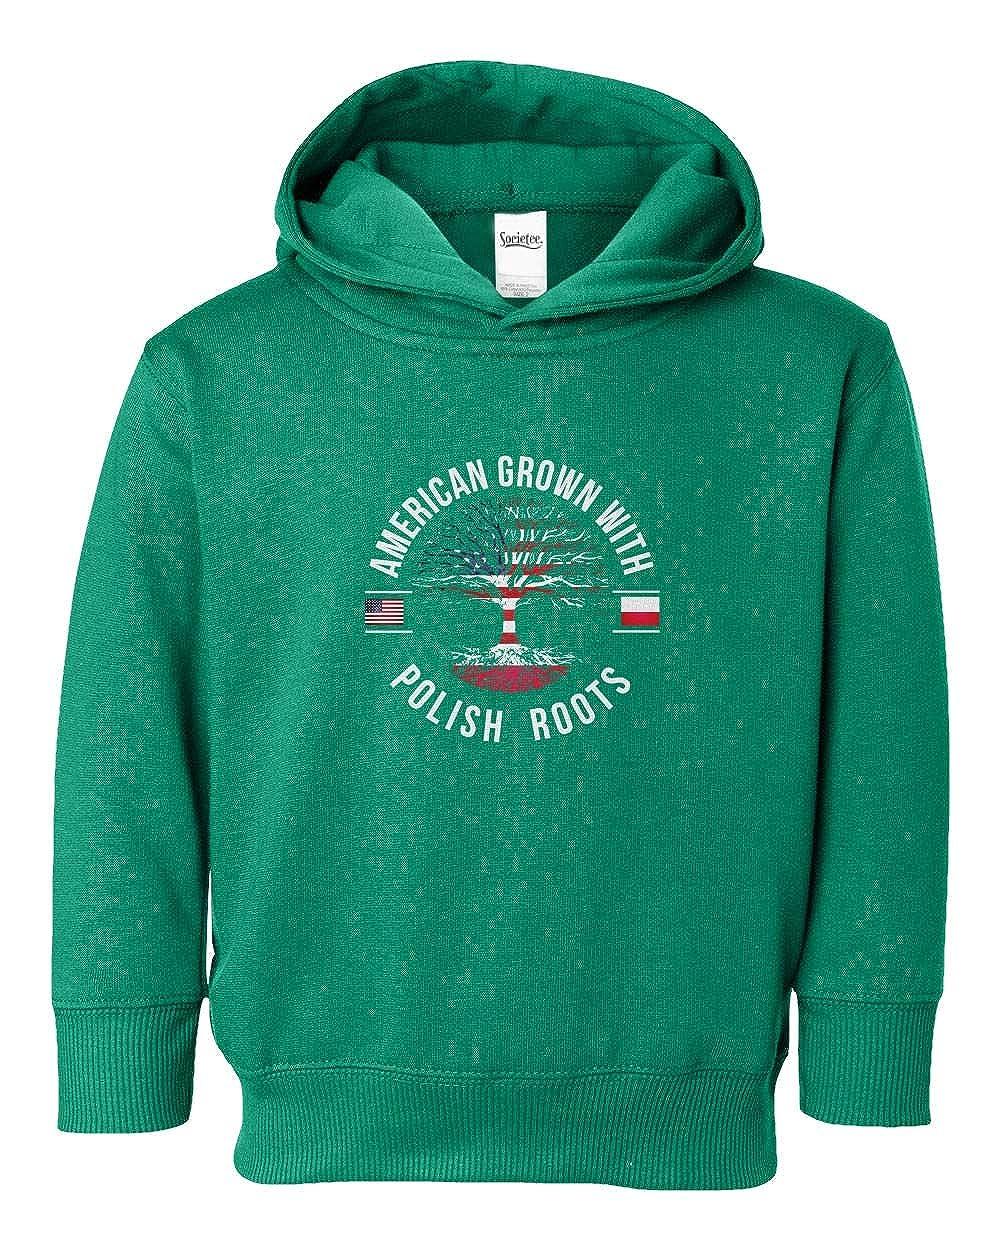 Societee American Grown with Polish Roots Youth /& Toddler Hoodie Sweatshirt